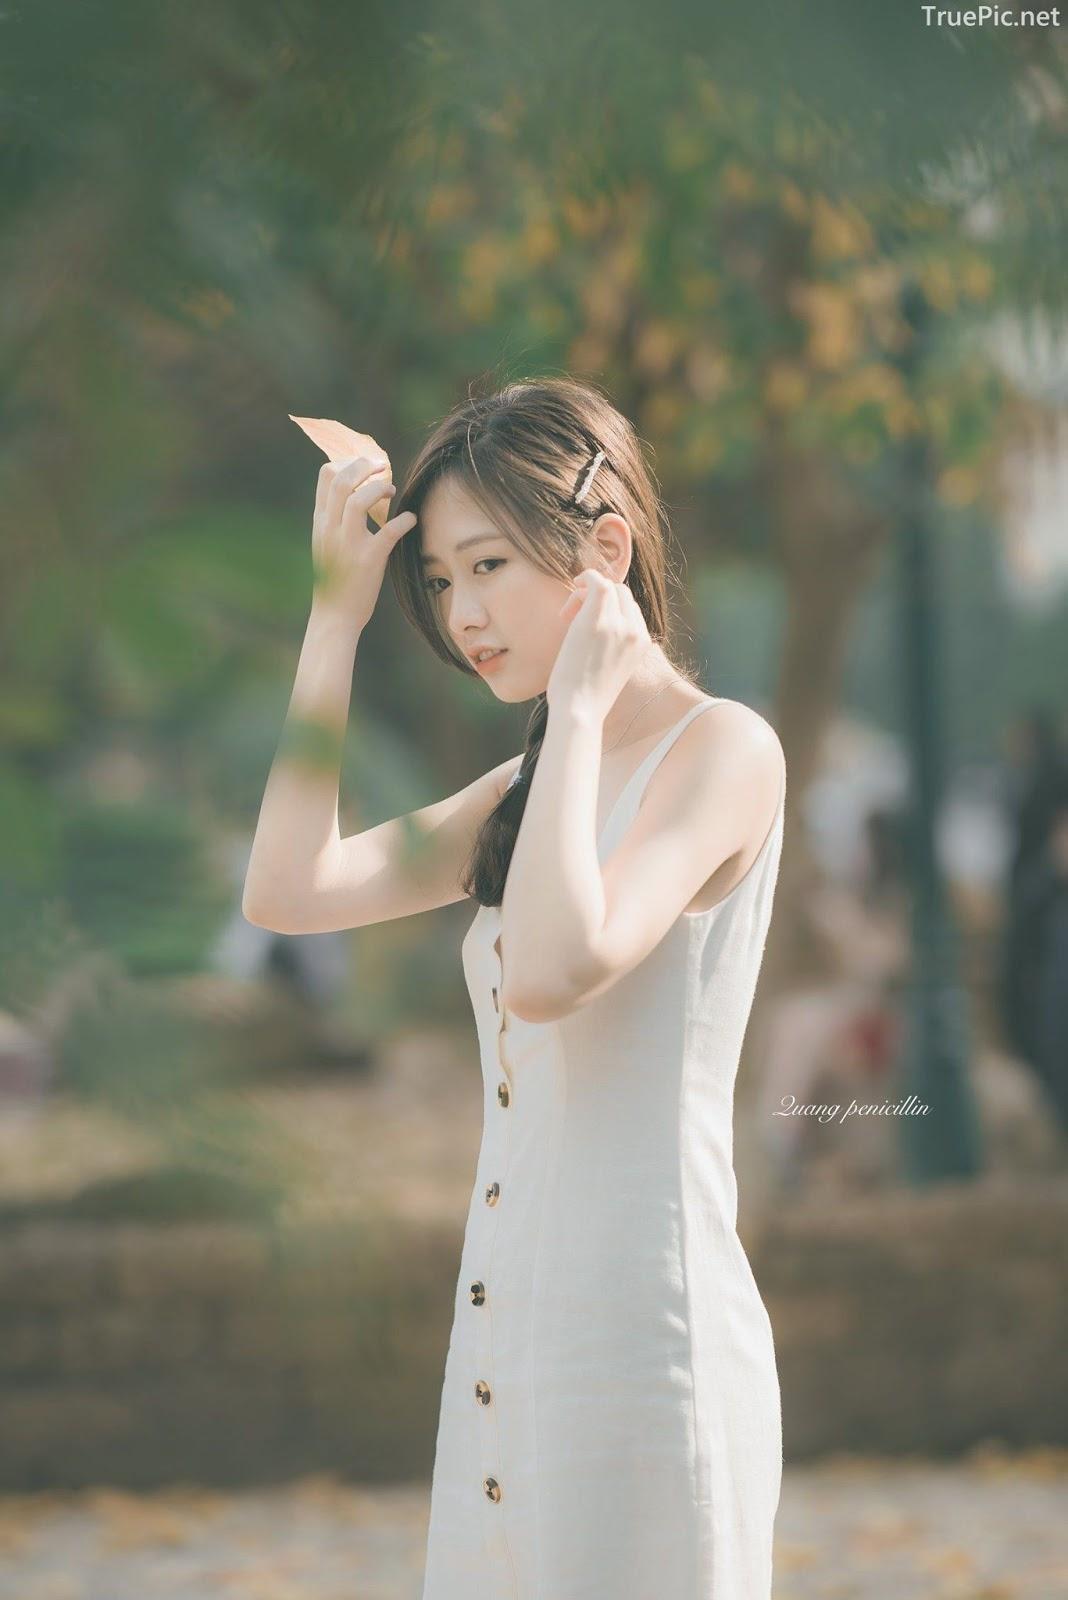 Vietnamese Hot Girl Linh Hoai - Season of falling leaves - TruePic.net - Picture 1